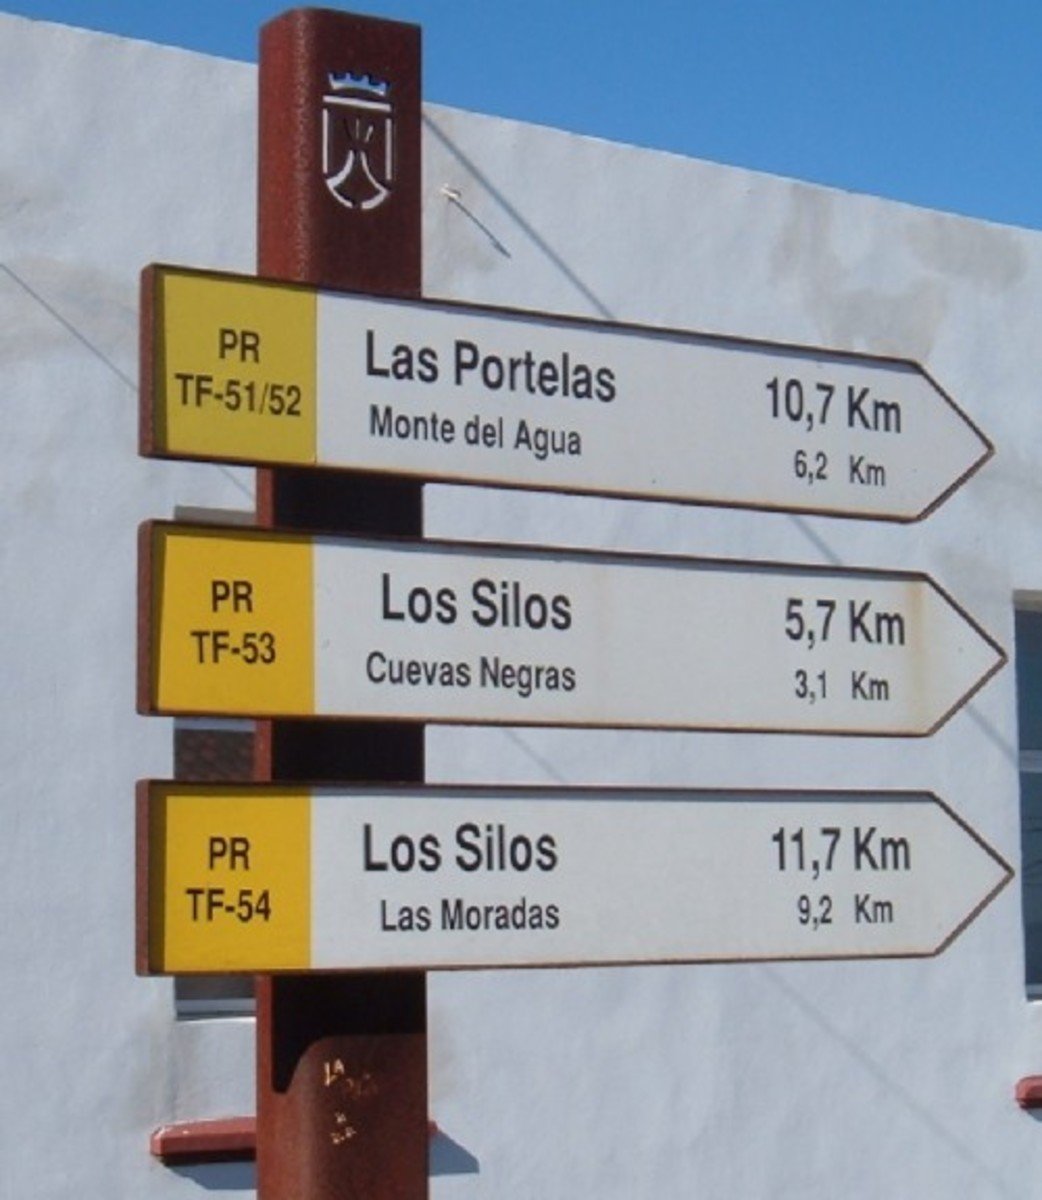 Erjos signpost for Cuevas Negras. Photo by Steve Andrews